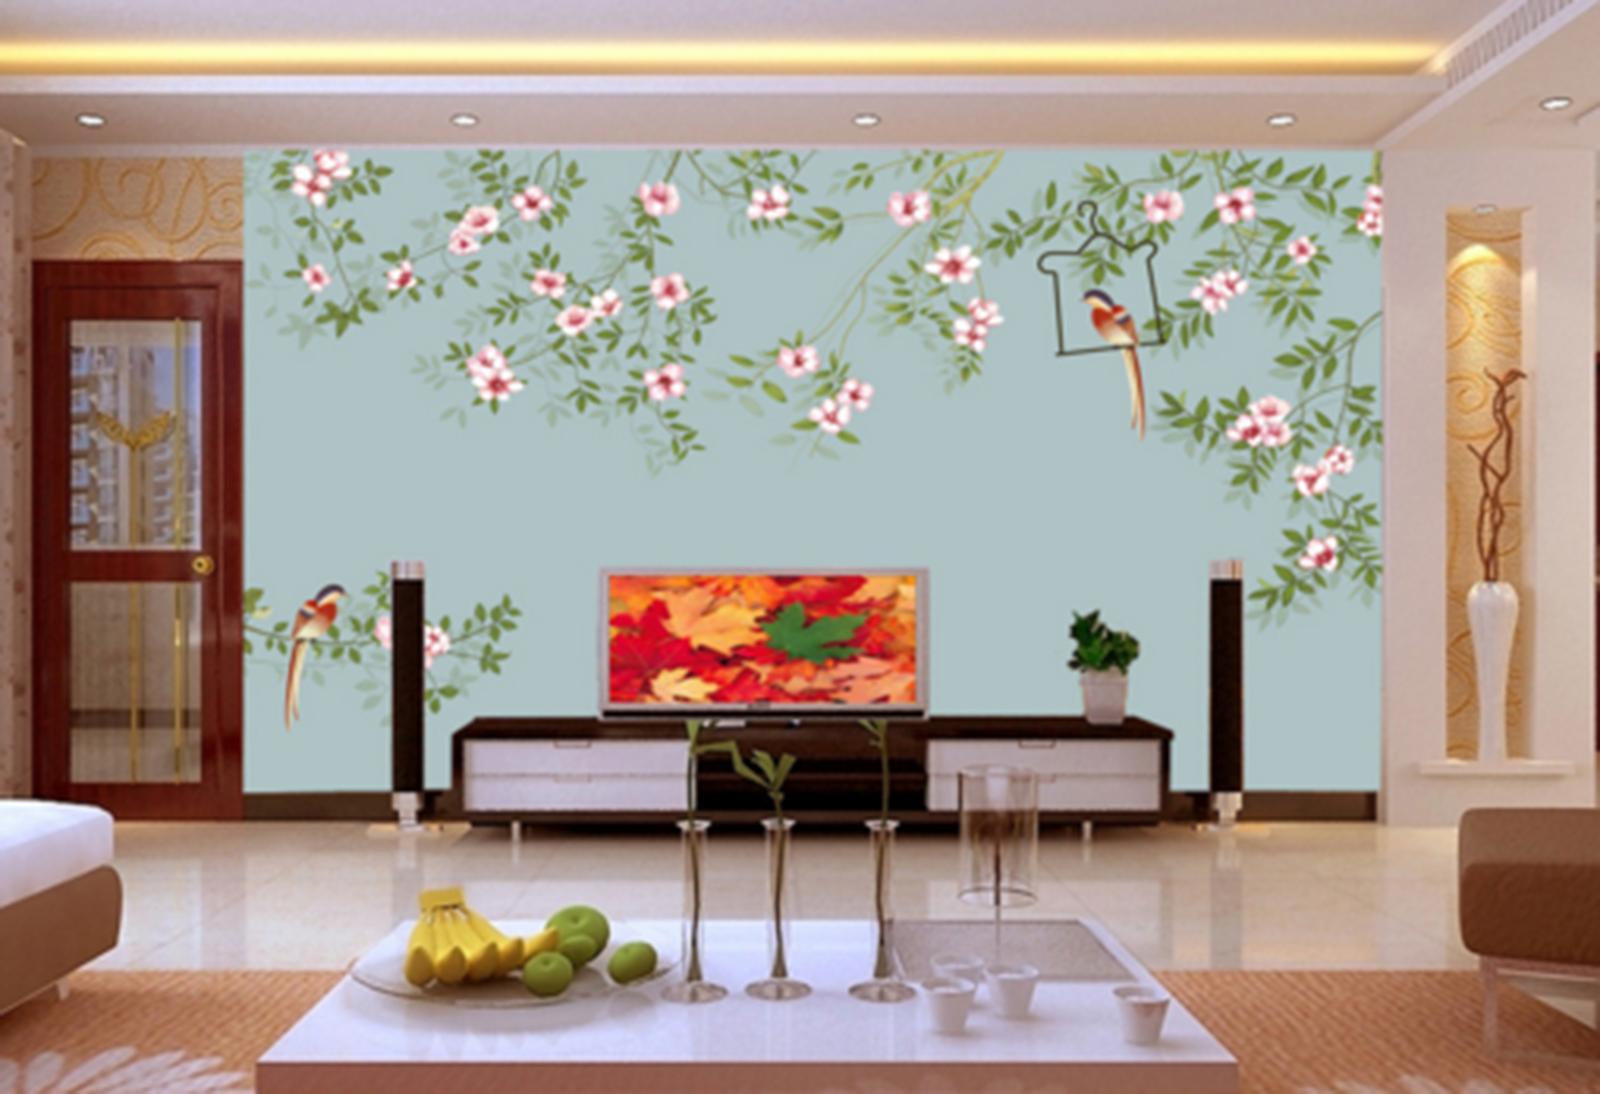 3D Vines Paint 459 Wallpaper Murals Wall Print Wallpaper Mural AJ WALL AU Kyra